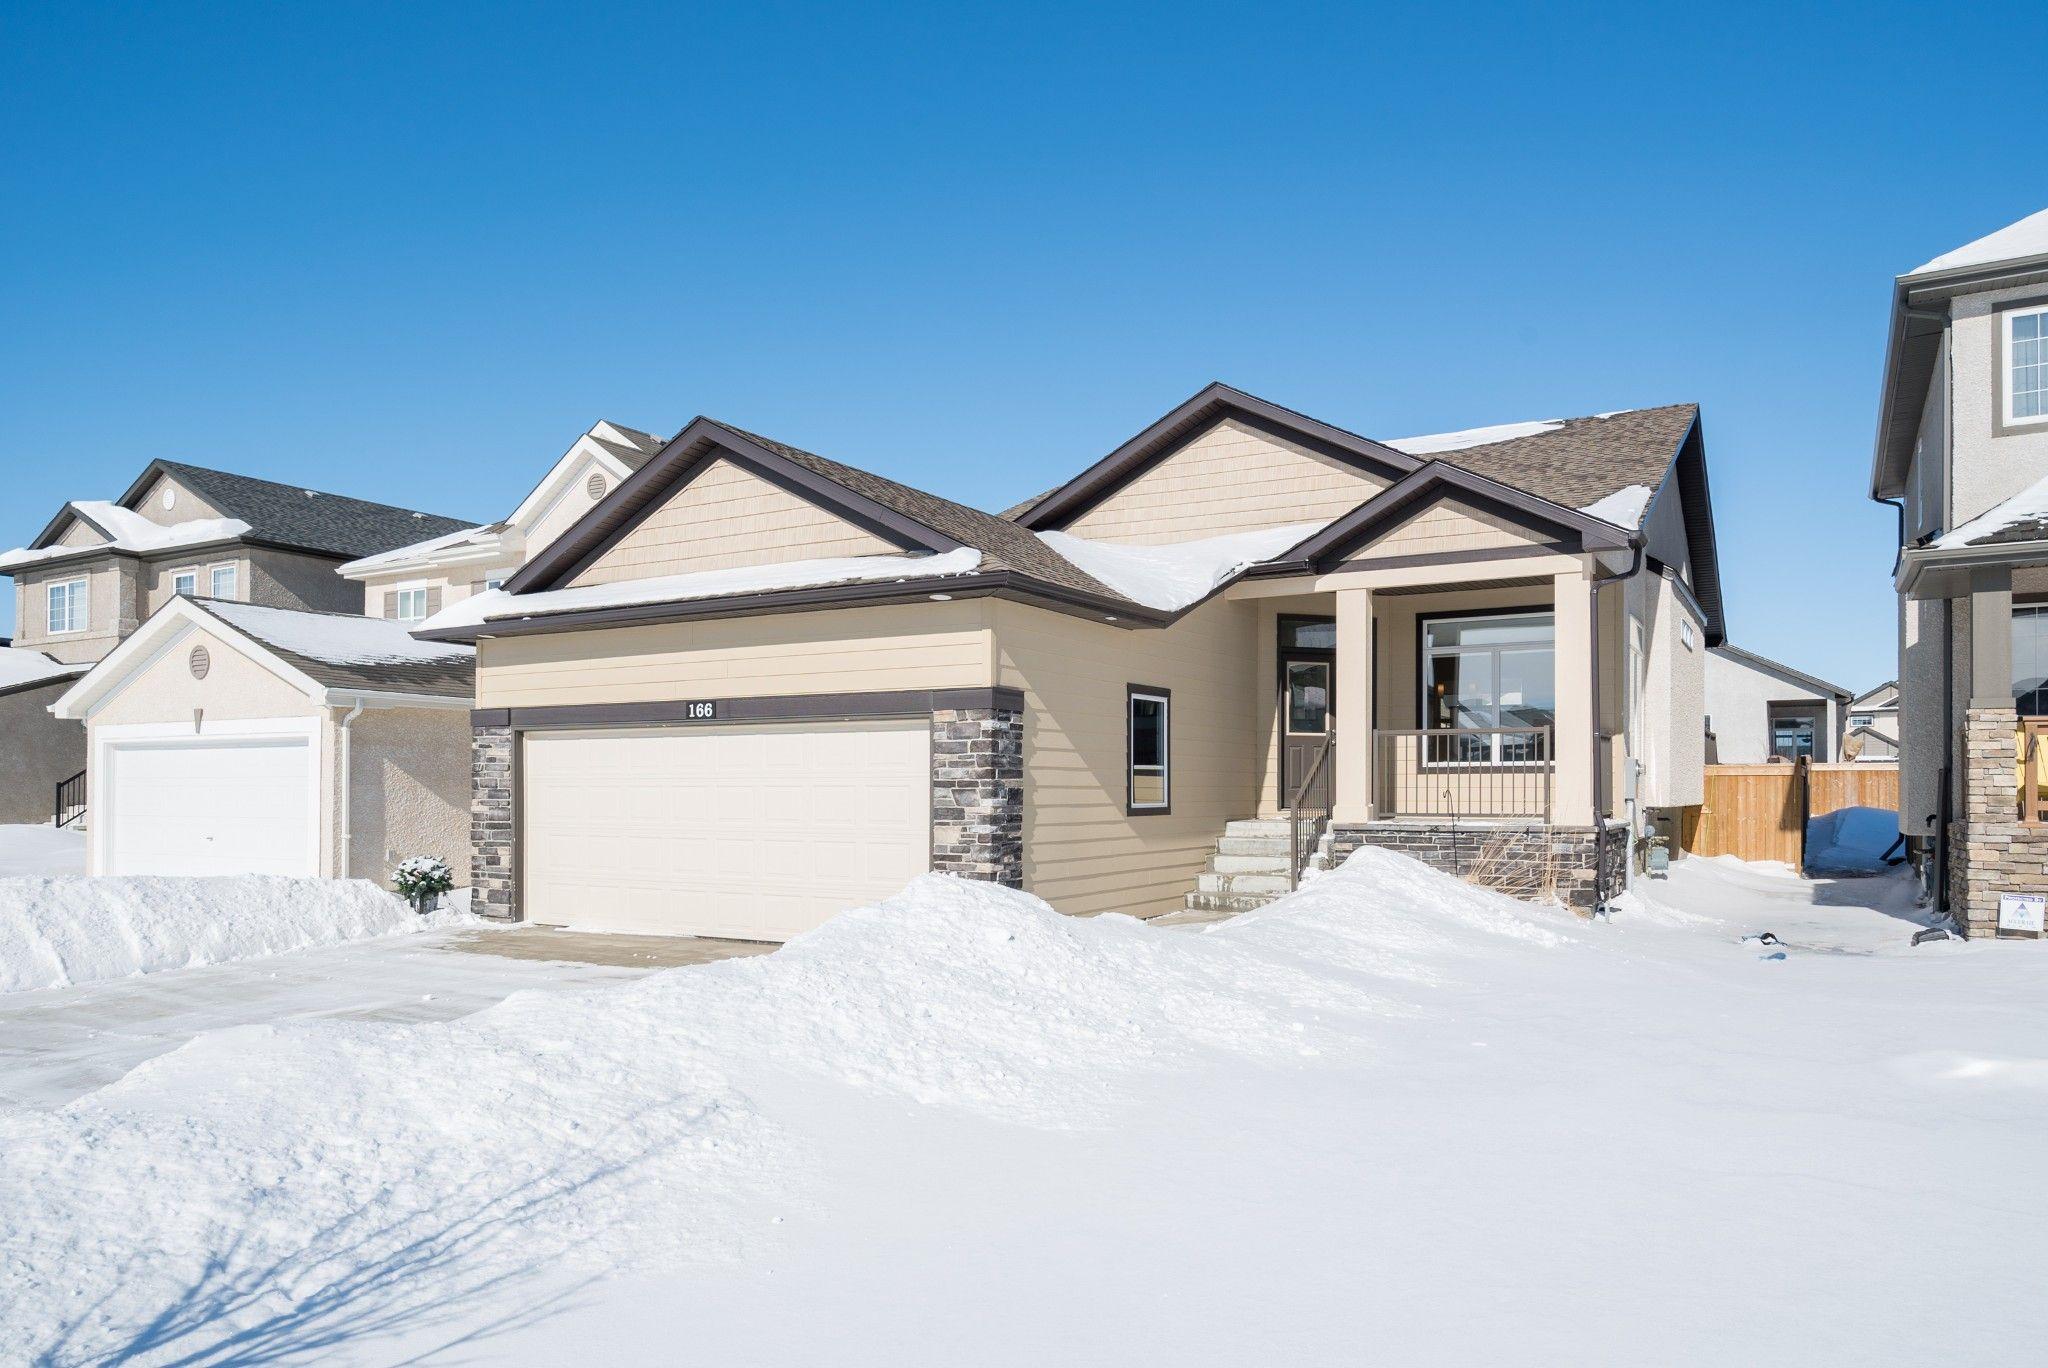 Main Photo: 166 Moonbeam Way in Winnipeg: Sage Creek House for sale (2K)  : MLS®# 1604837